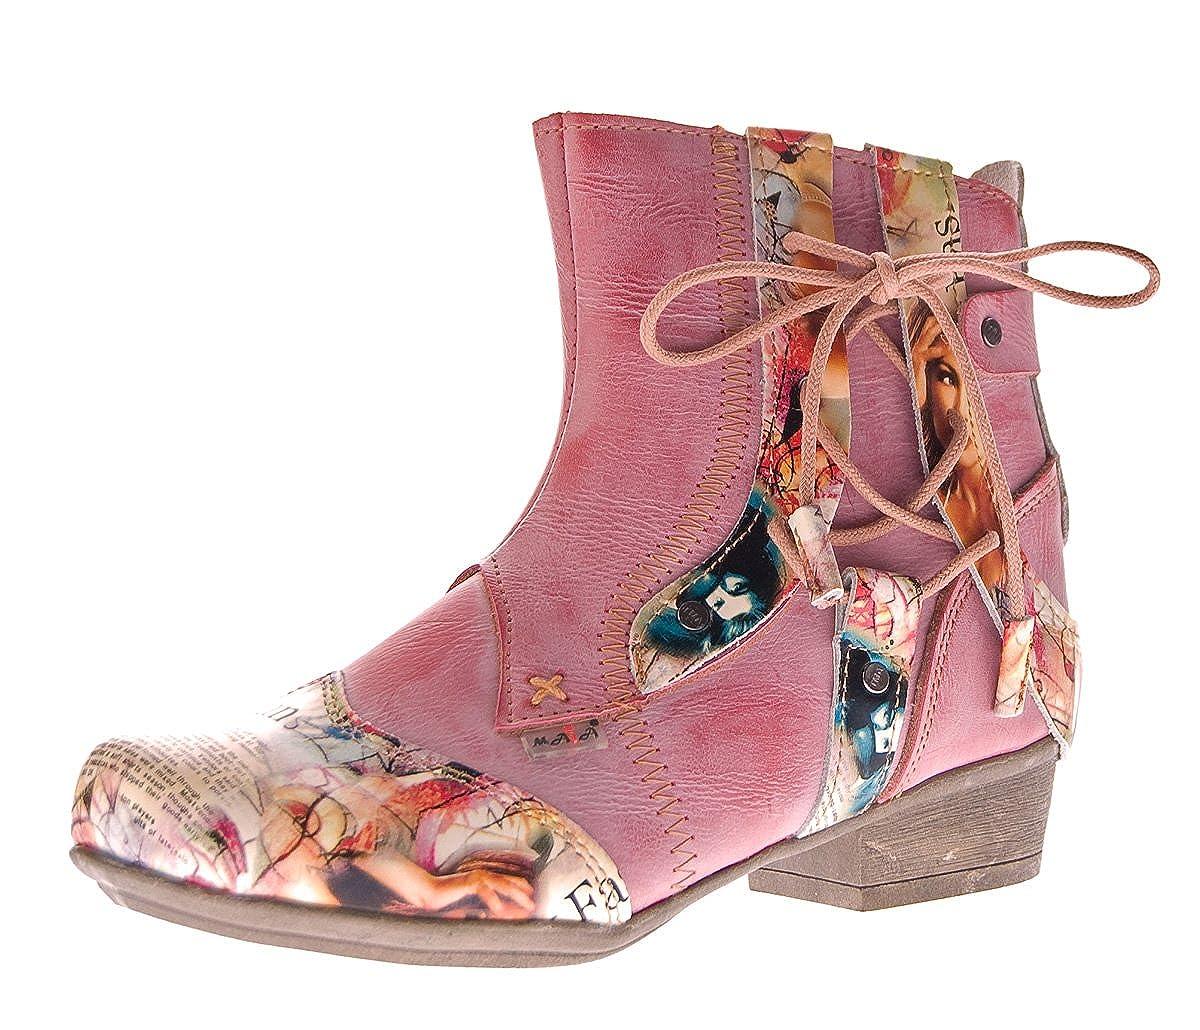 TMA Damen Damen Damen Stiefeletten Comfort Stiefel Echtleder Schwarz Blau Rot Leder Schuhe 6186 Gr. 36-42 7f0794